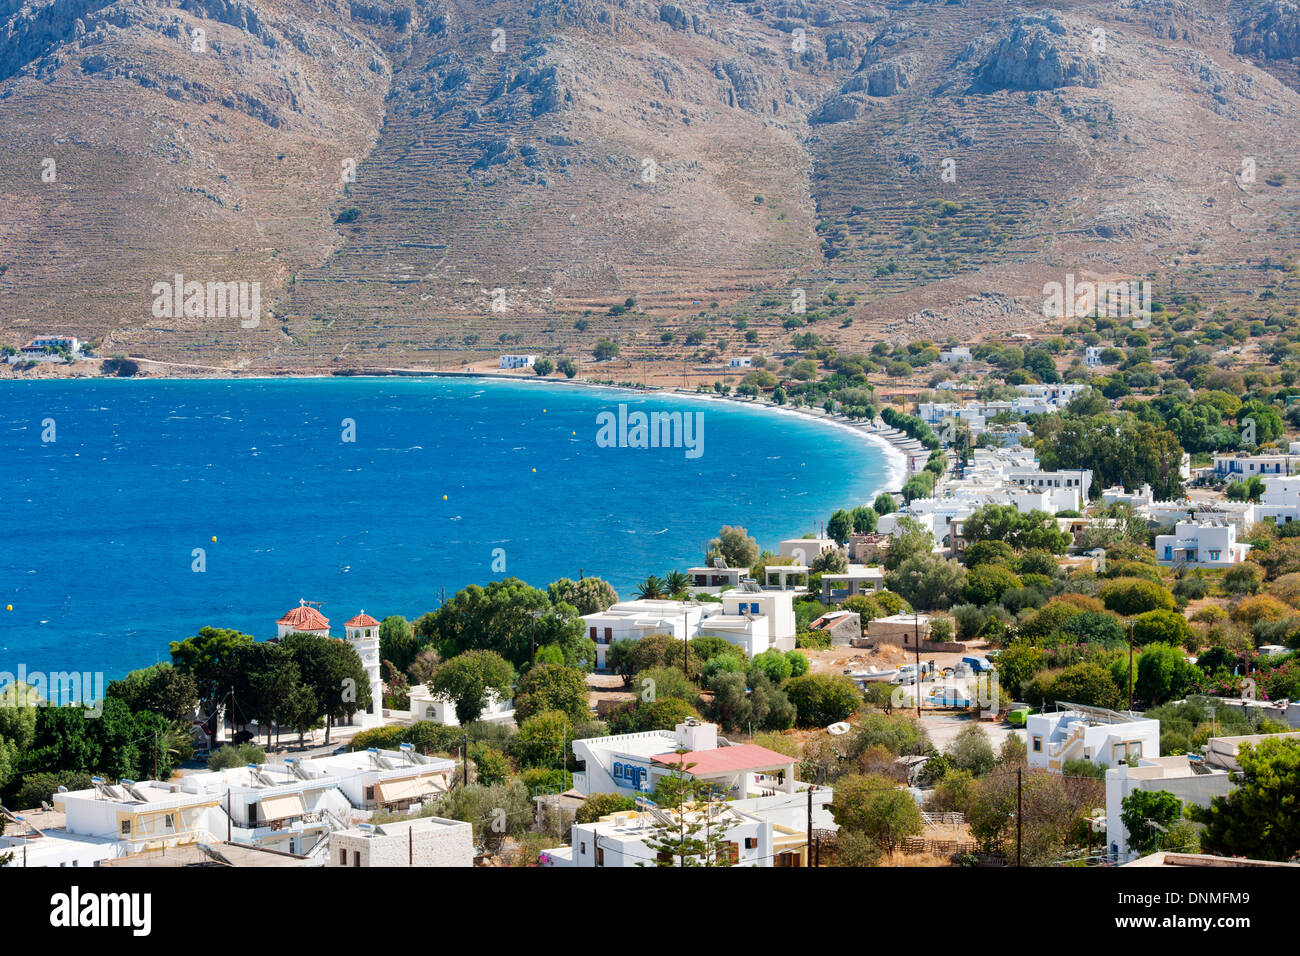 Griechenland, Insel Tilos, Hafenort Livadia - Stock Image